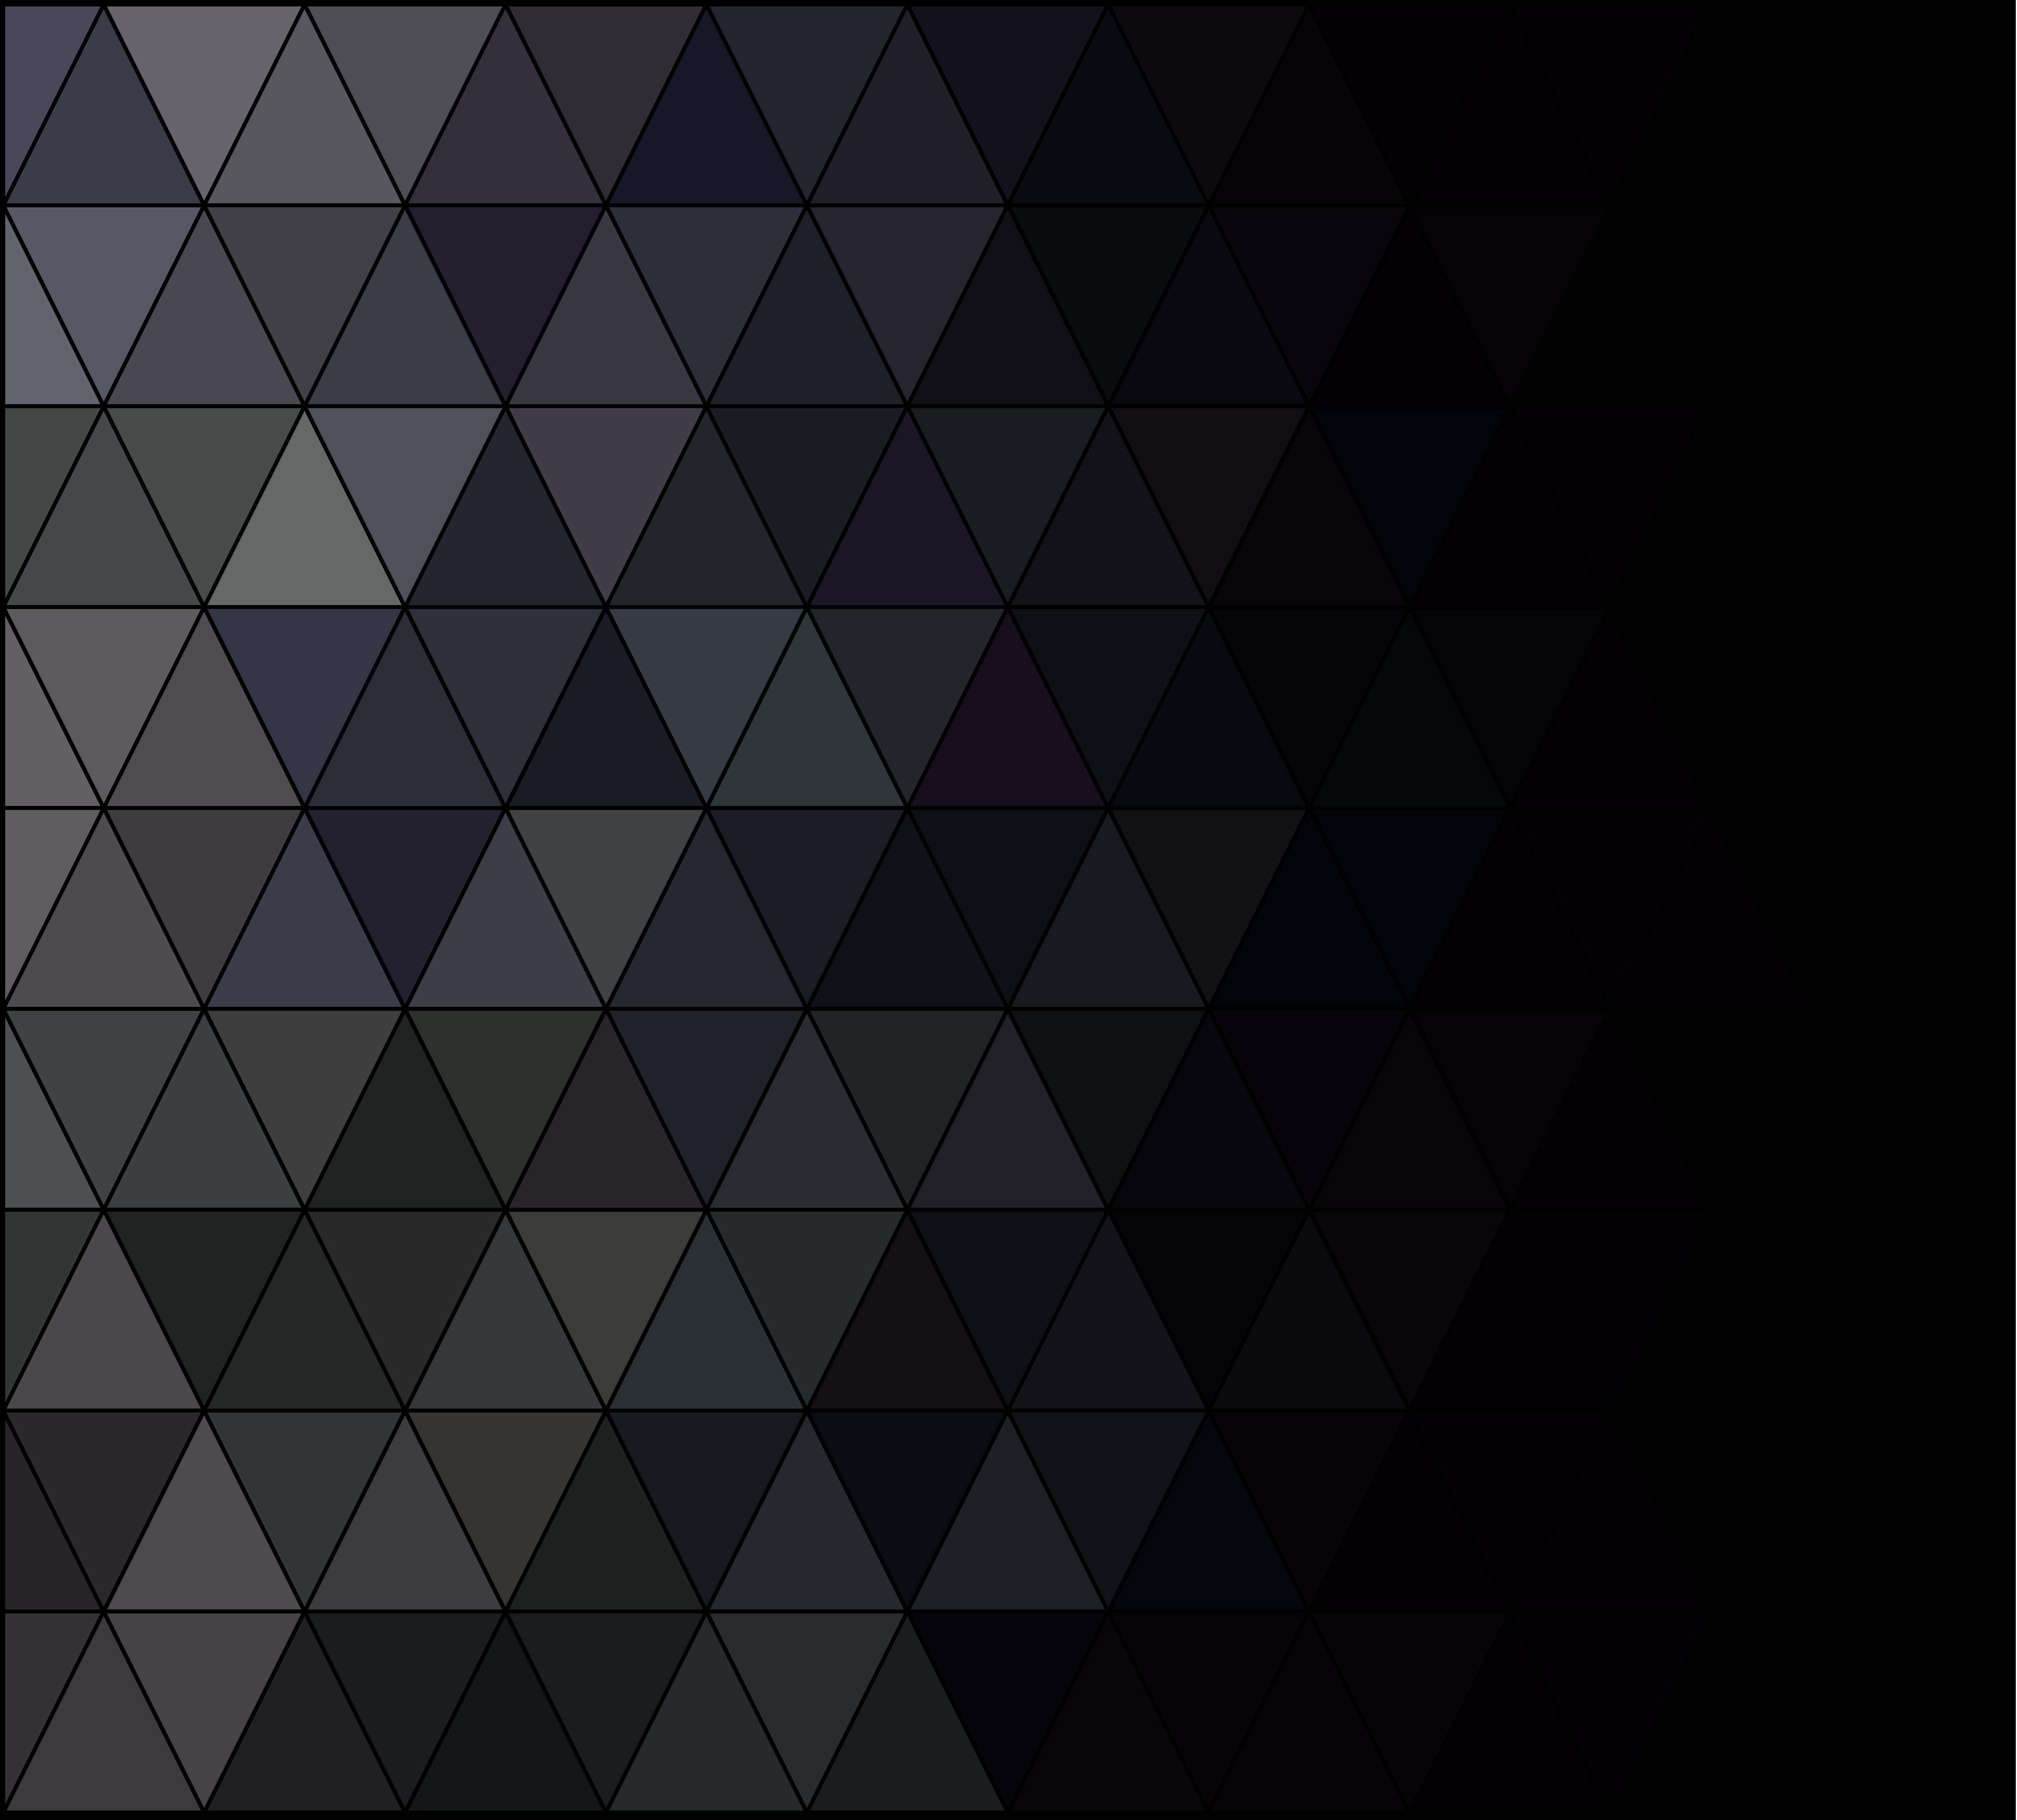 Black Square Grid Mosaic Background, Creative Design